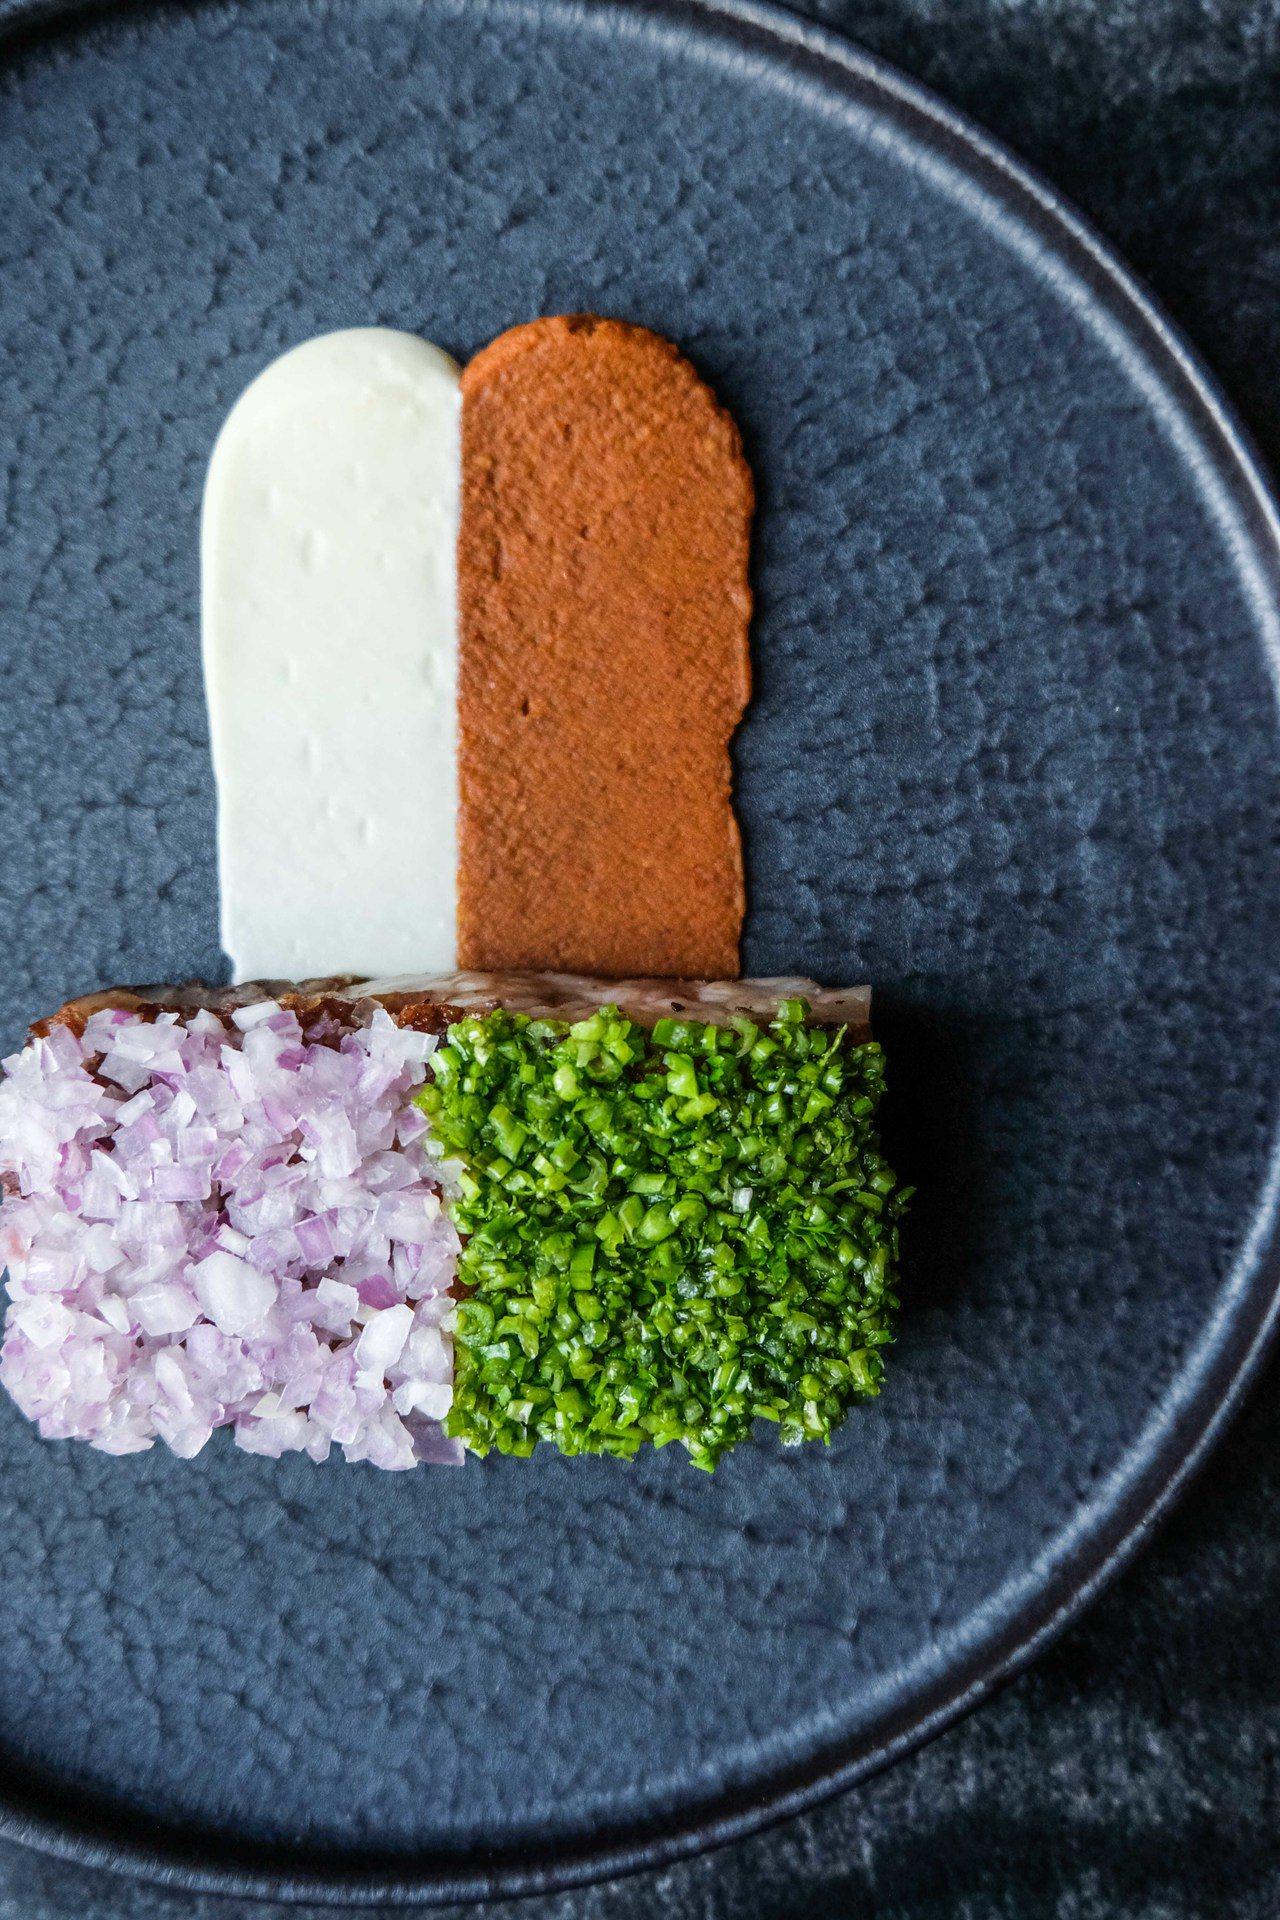 Chef Nik 客座主廚菜單-美國頂級紐約客牛排,傳統墨西哥辣豆醬,巧達起司。...